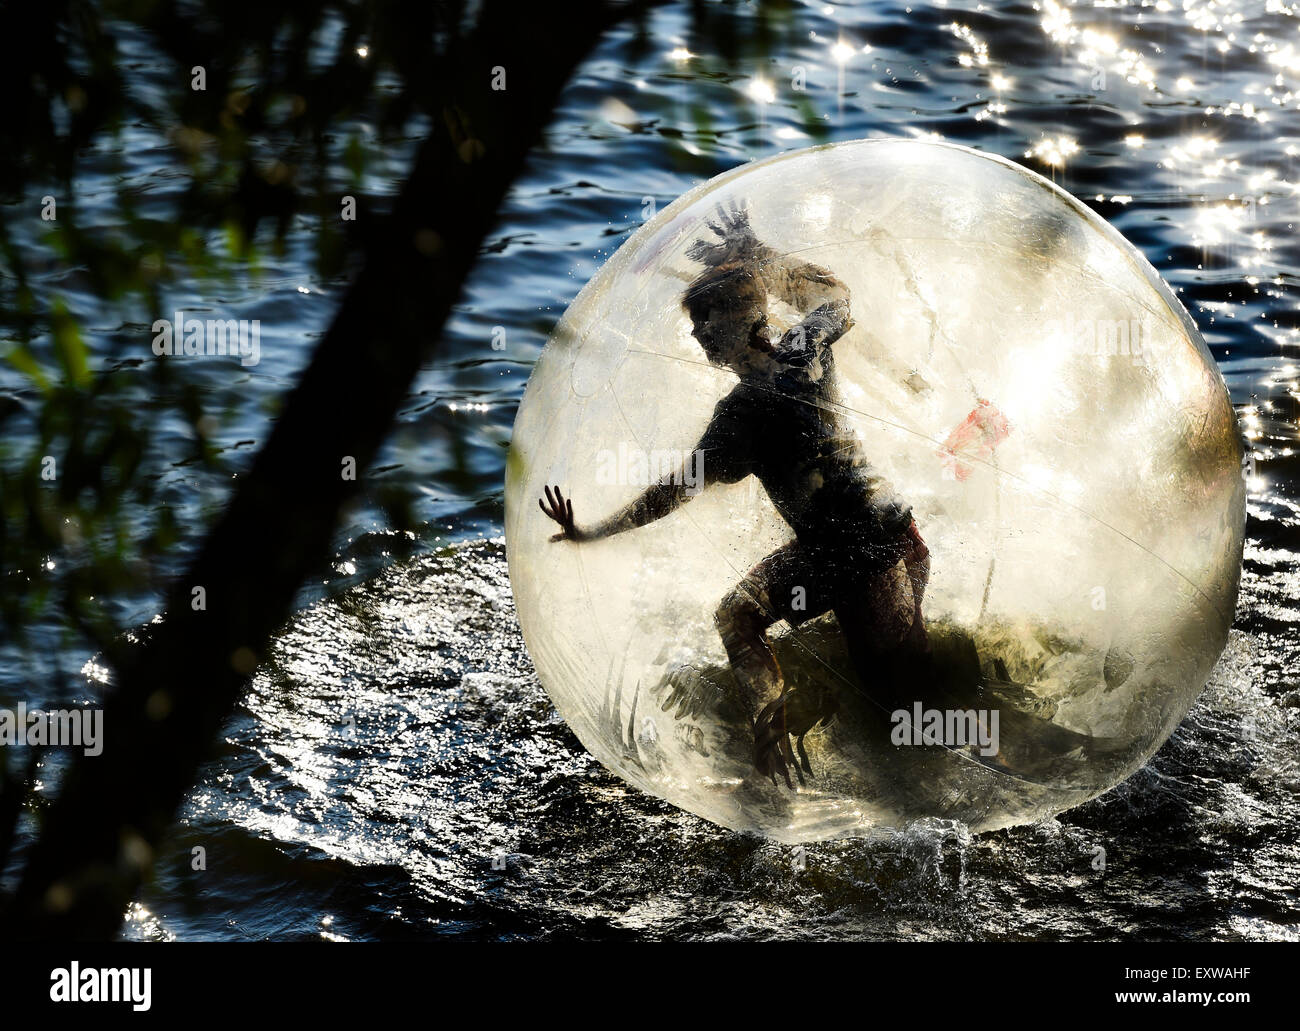 Prague, Czech Republic. 16th July, 2015. Zorbing, summer atraction at the Vltava river in Prague, Czech Republic, Stock Photo